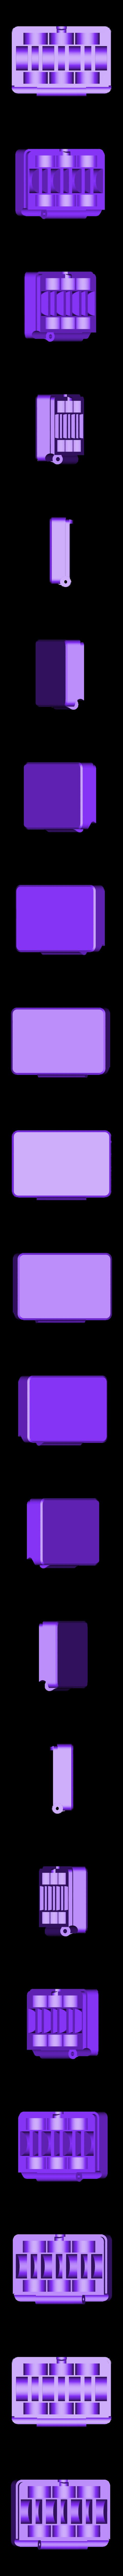 LR44_AG13_case_1.stl Download free STL file CR2032, LR44, AG13 Coin Battery Case • 3D printable object, parkgwansu339